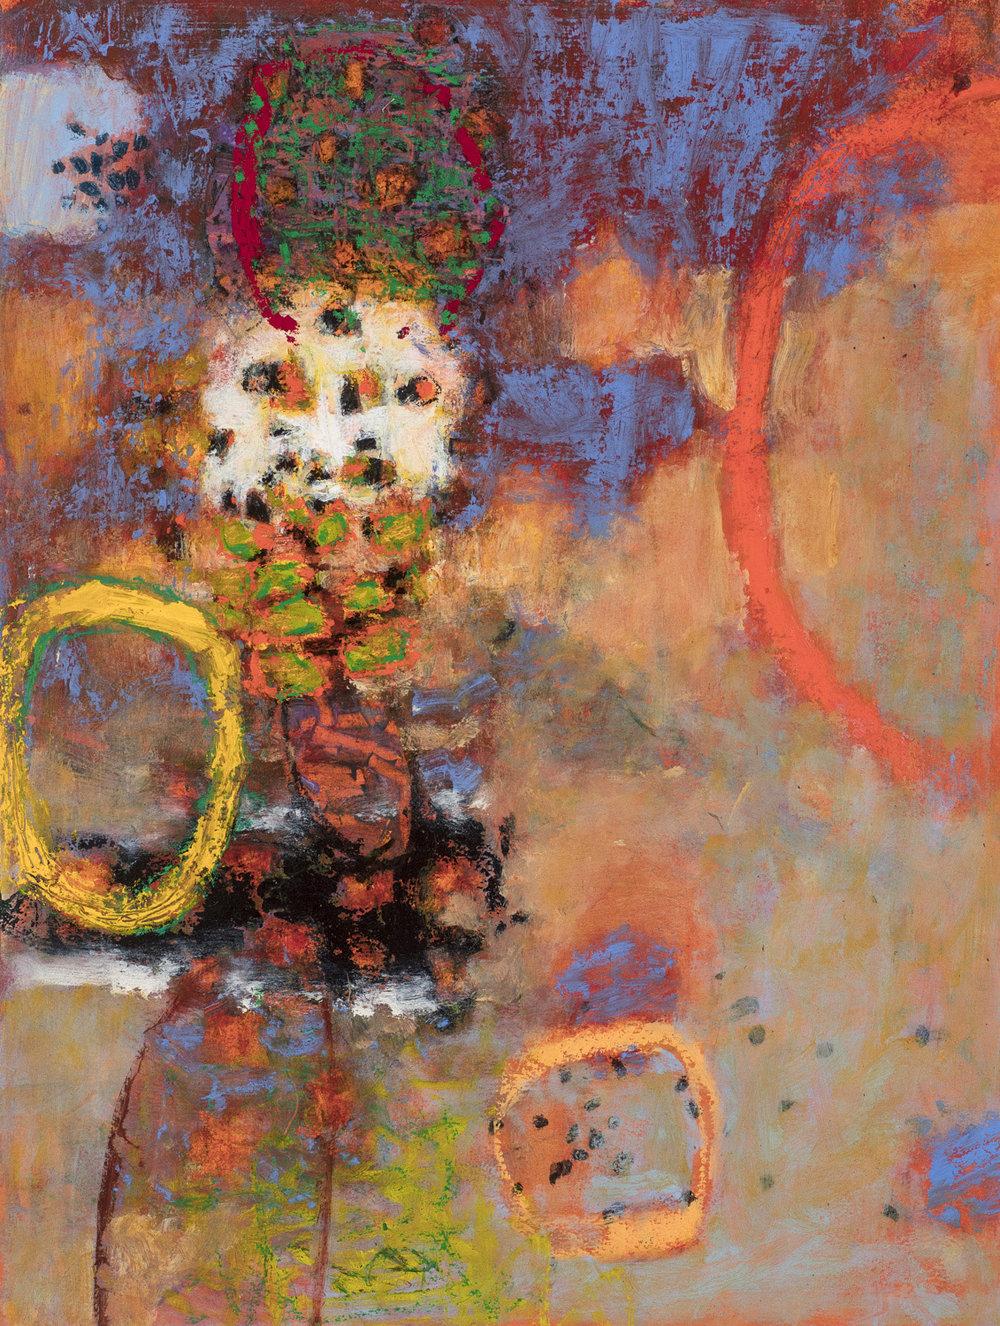 "Like a Dream  | oil on fine art paper | 25 x 19"" | 2017"